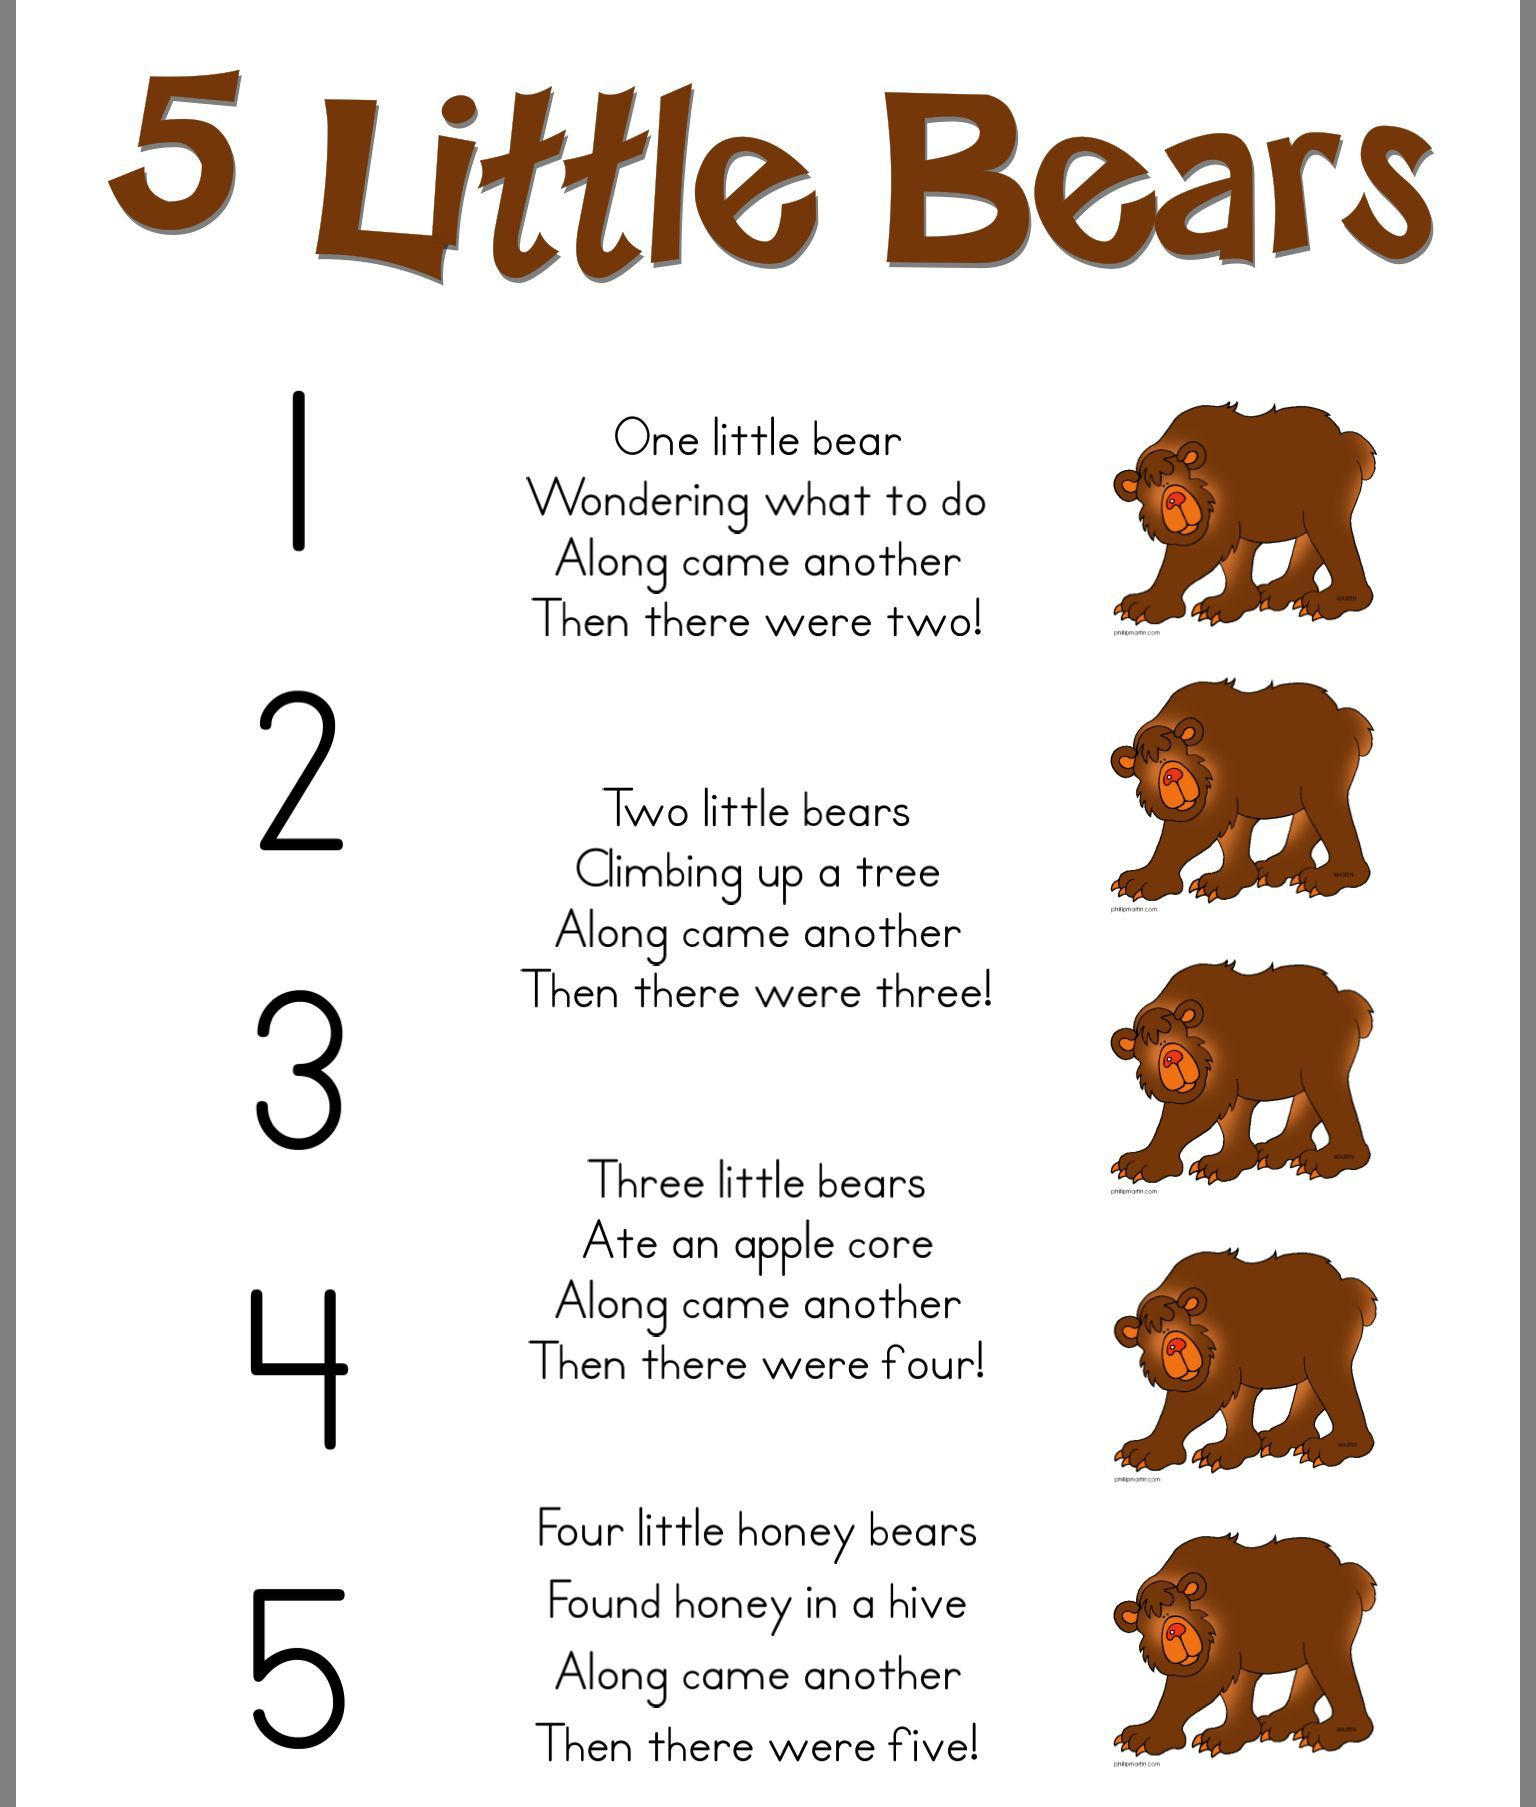 5 Little Bears Poem